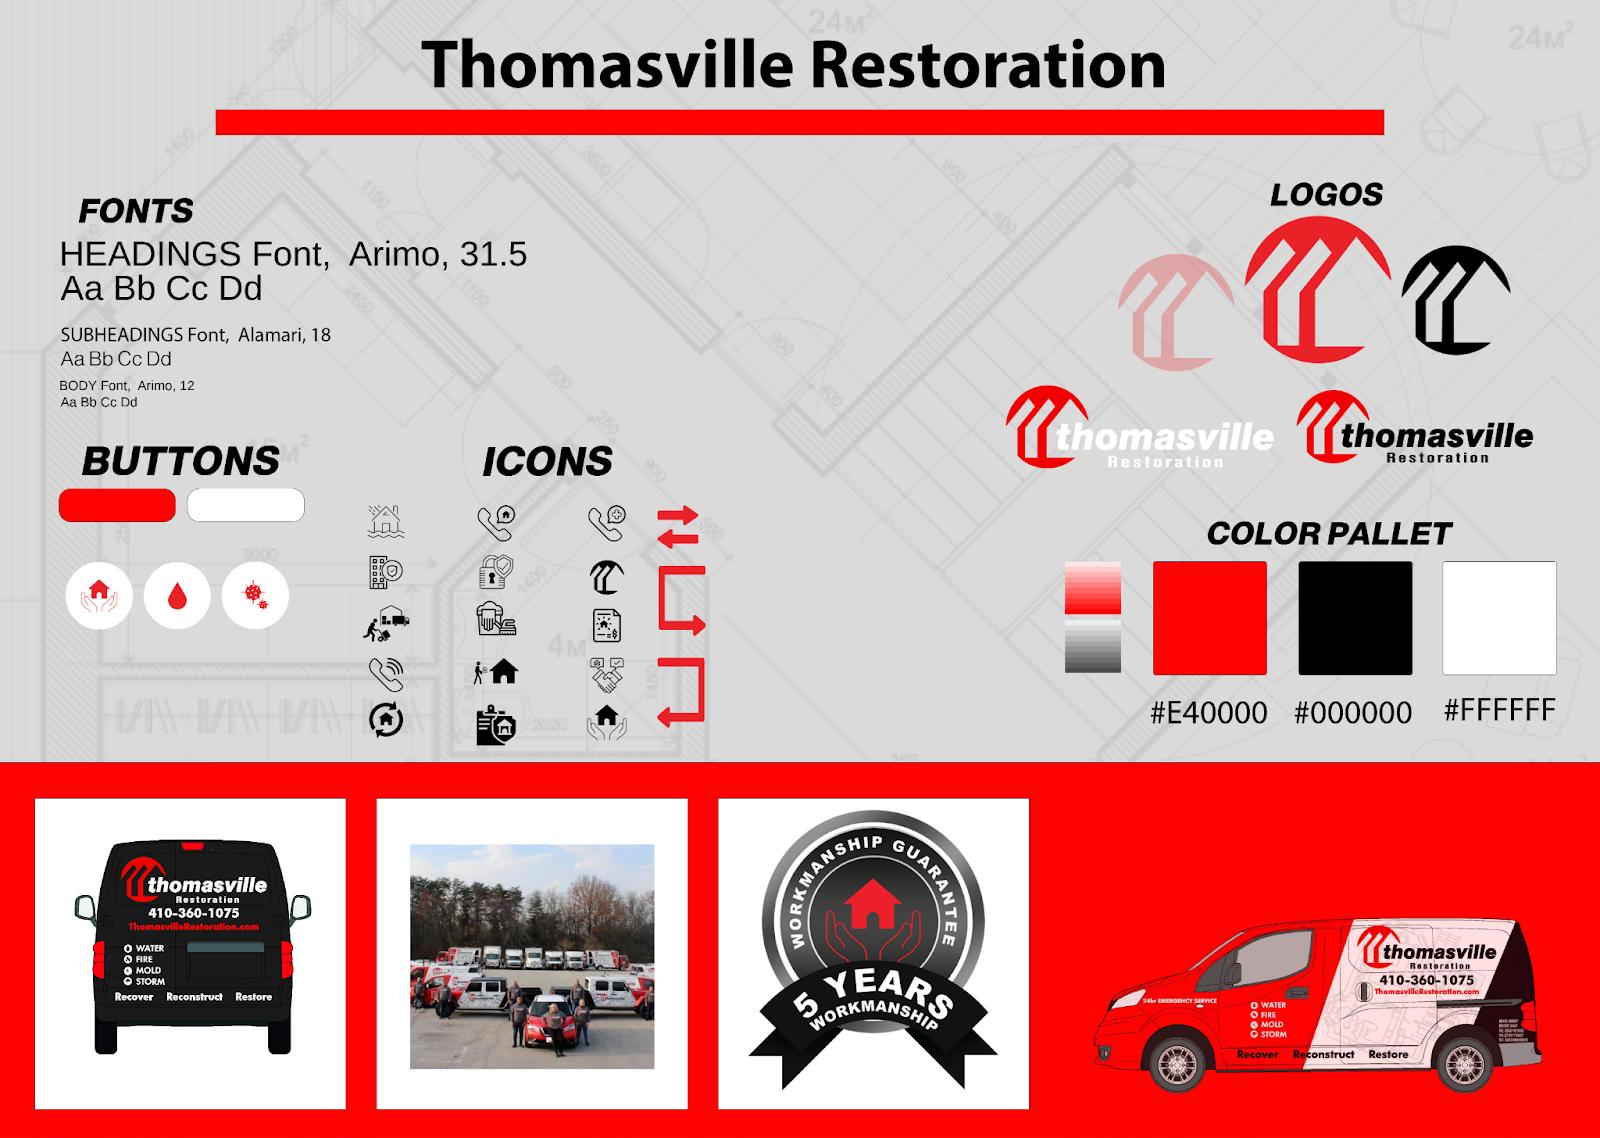 Thomasville Restoration Style Guide